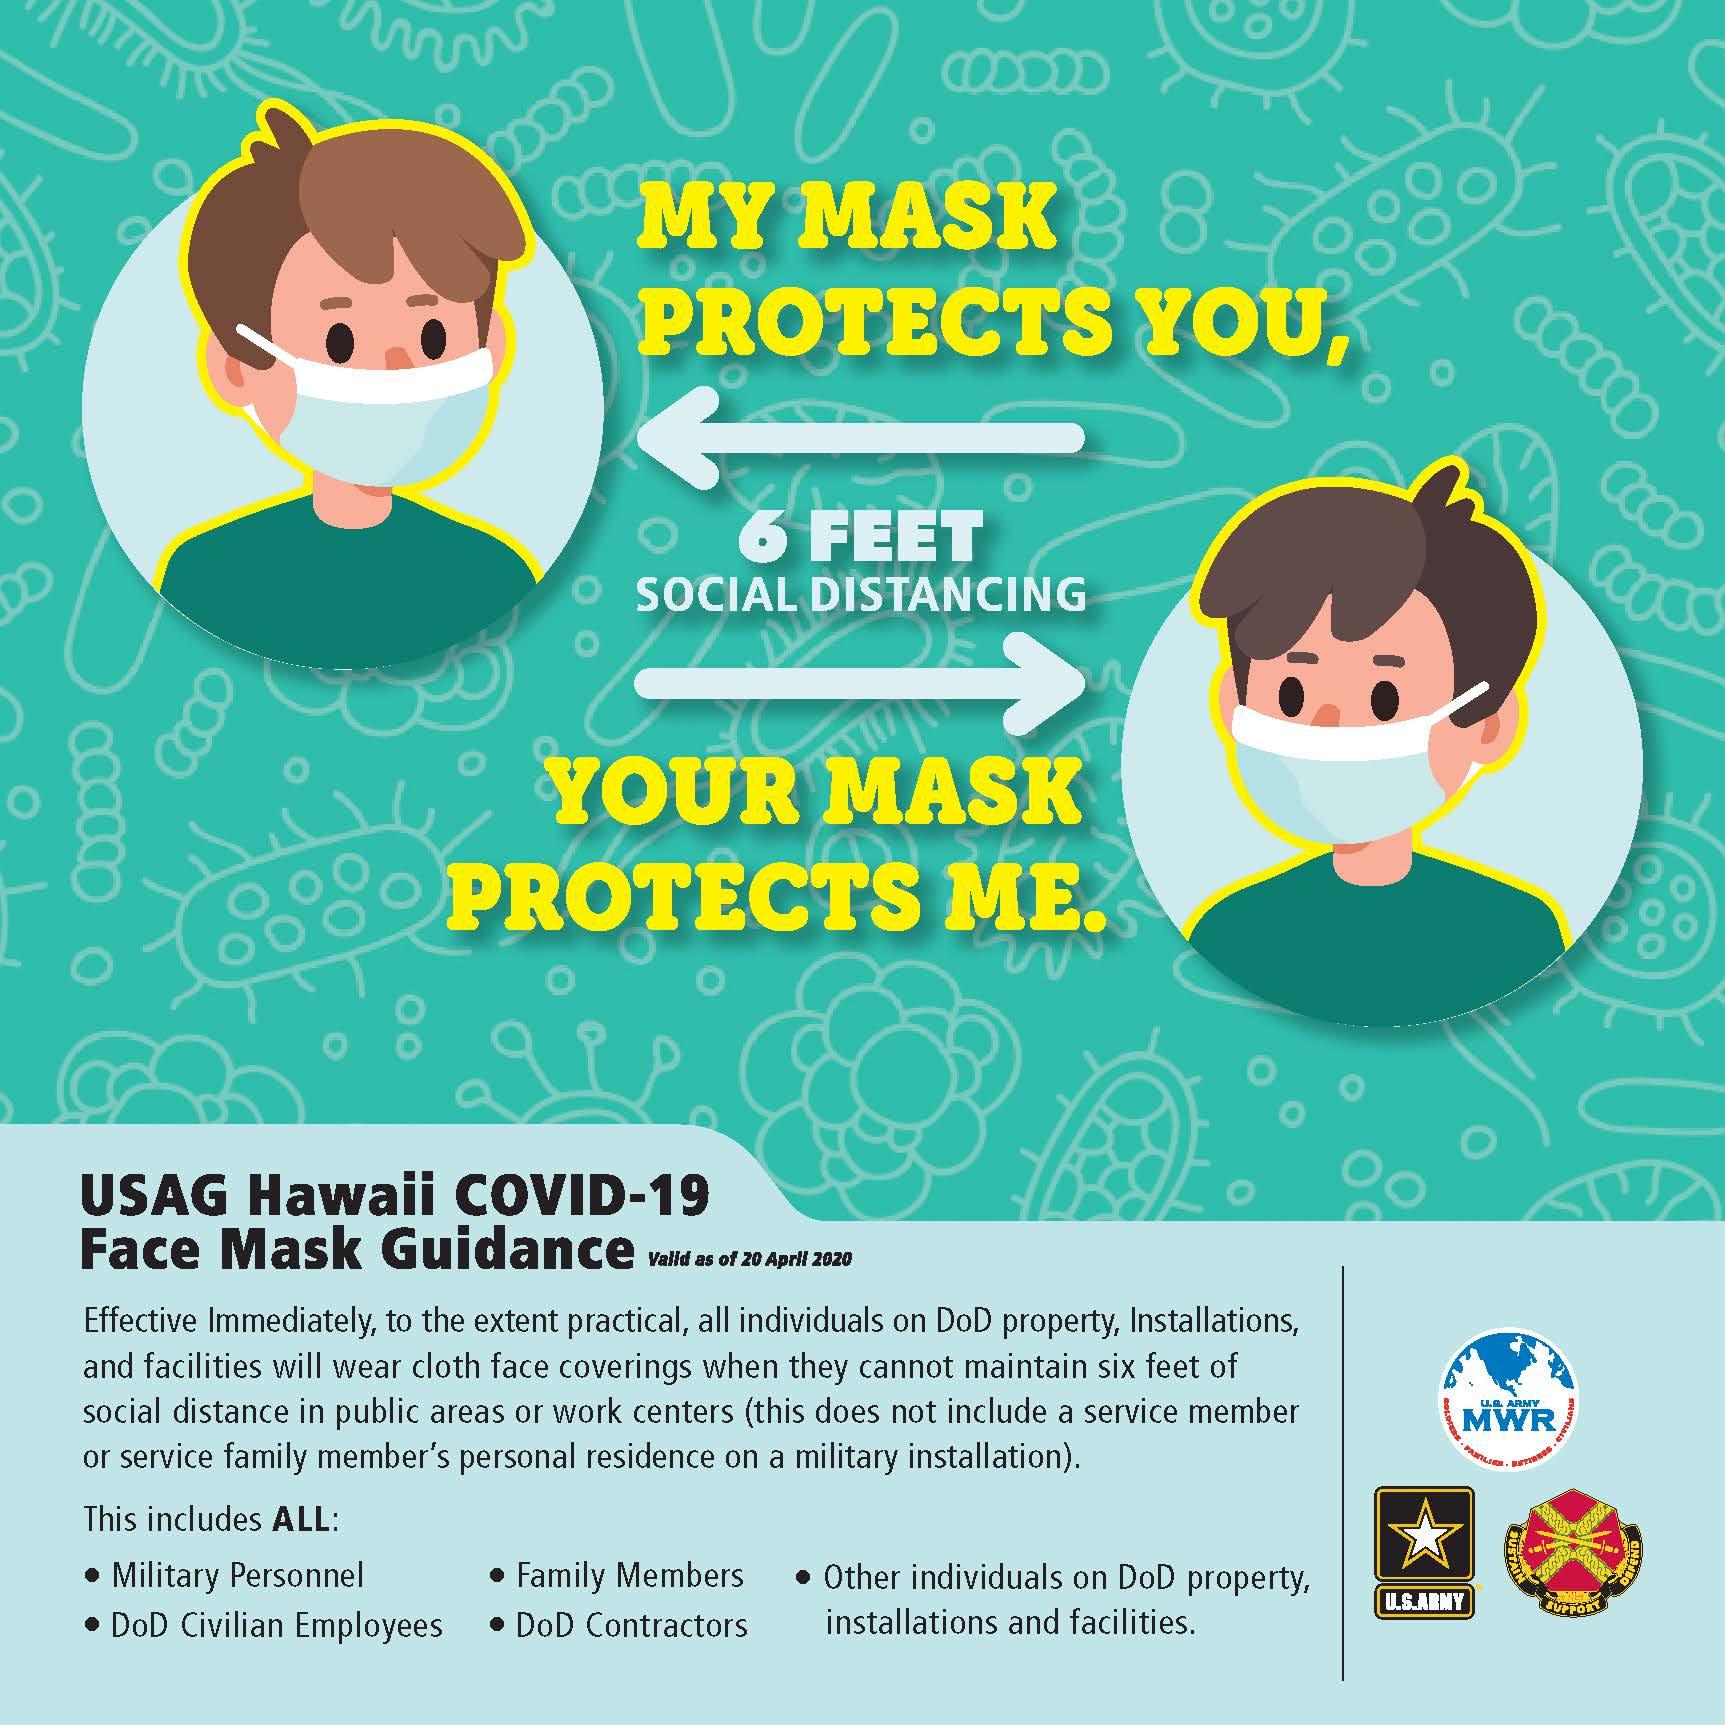 US Army MWR :: COVID-19 Mask Guidance